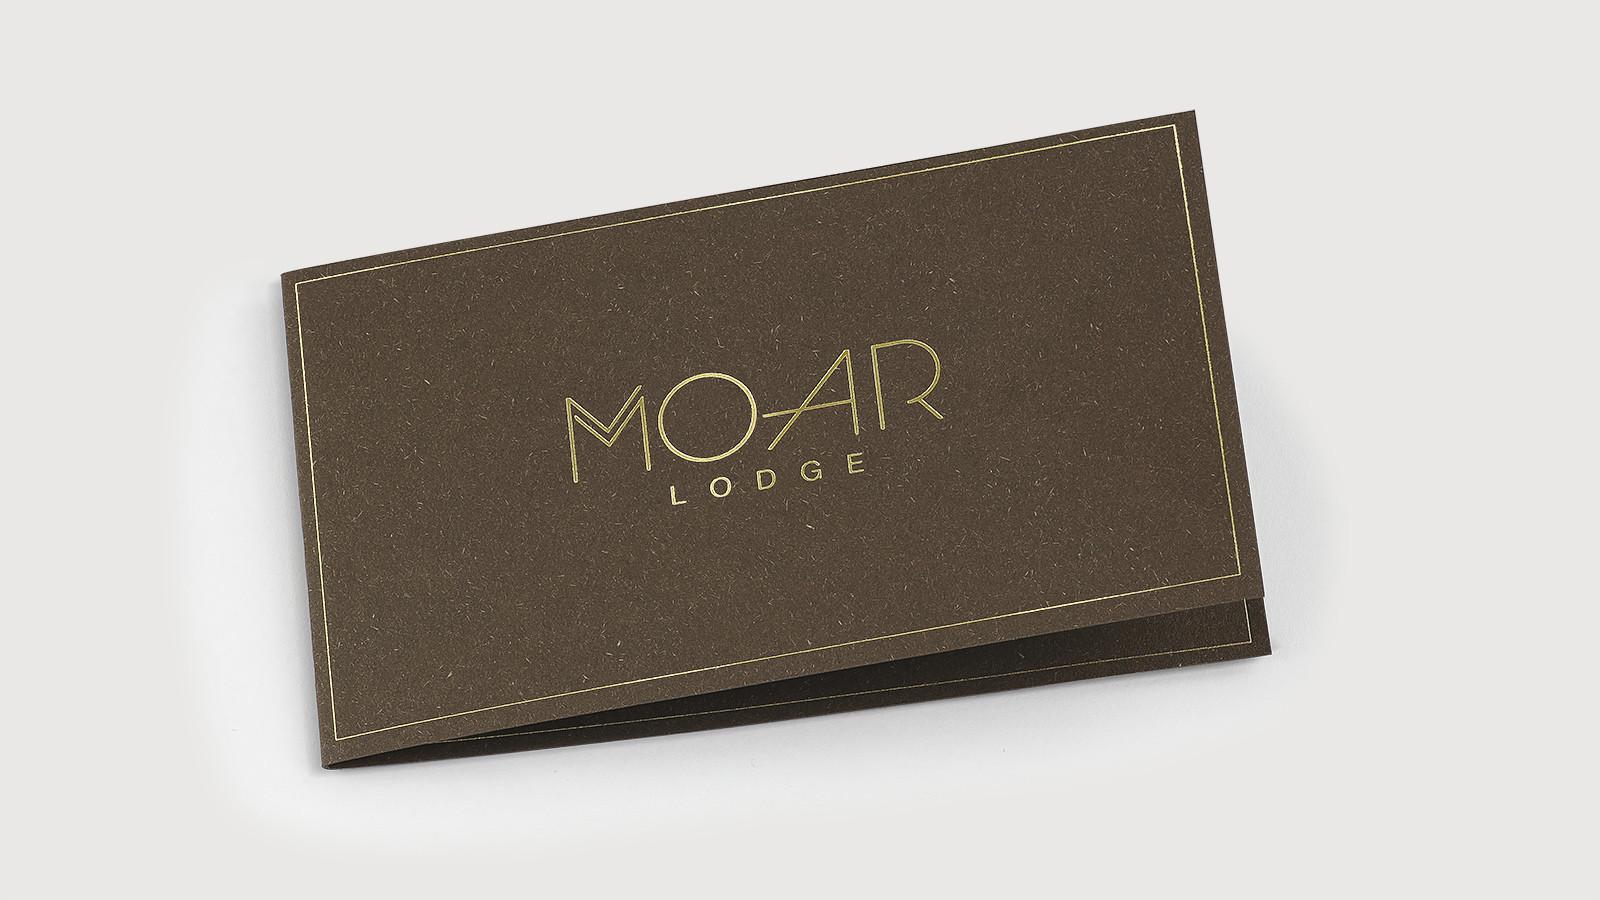 Moard_Lodge_1